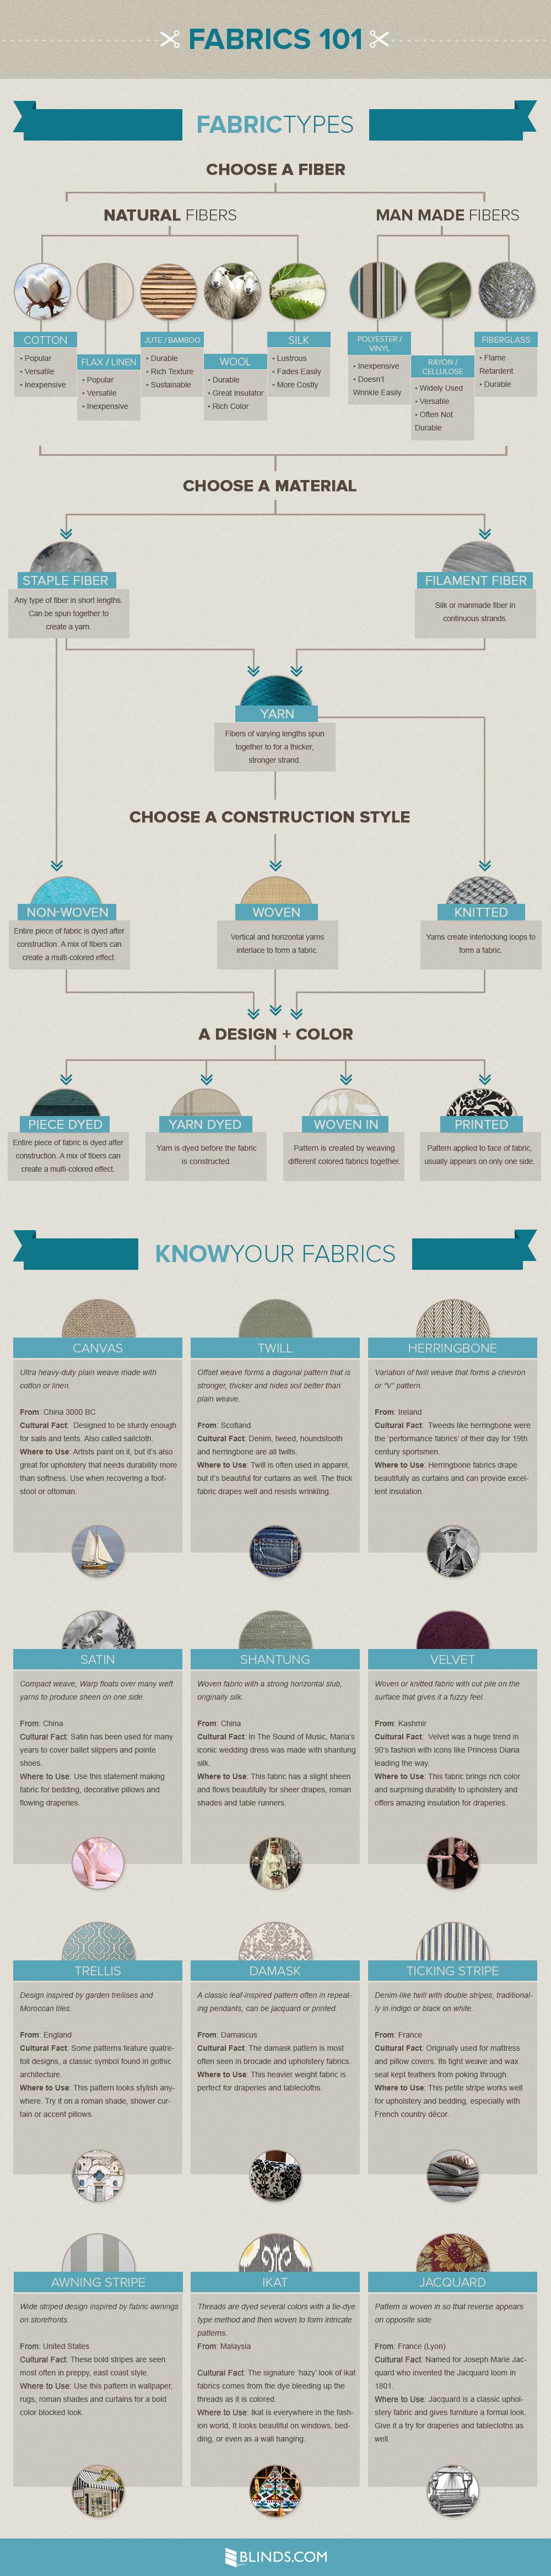 Infographic: Fabrics 101